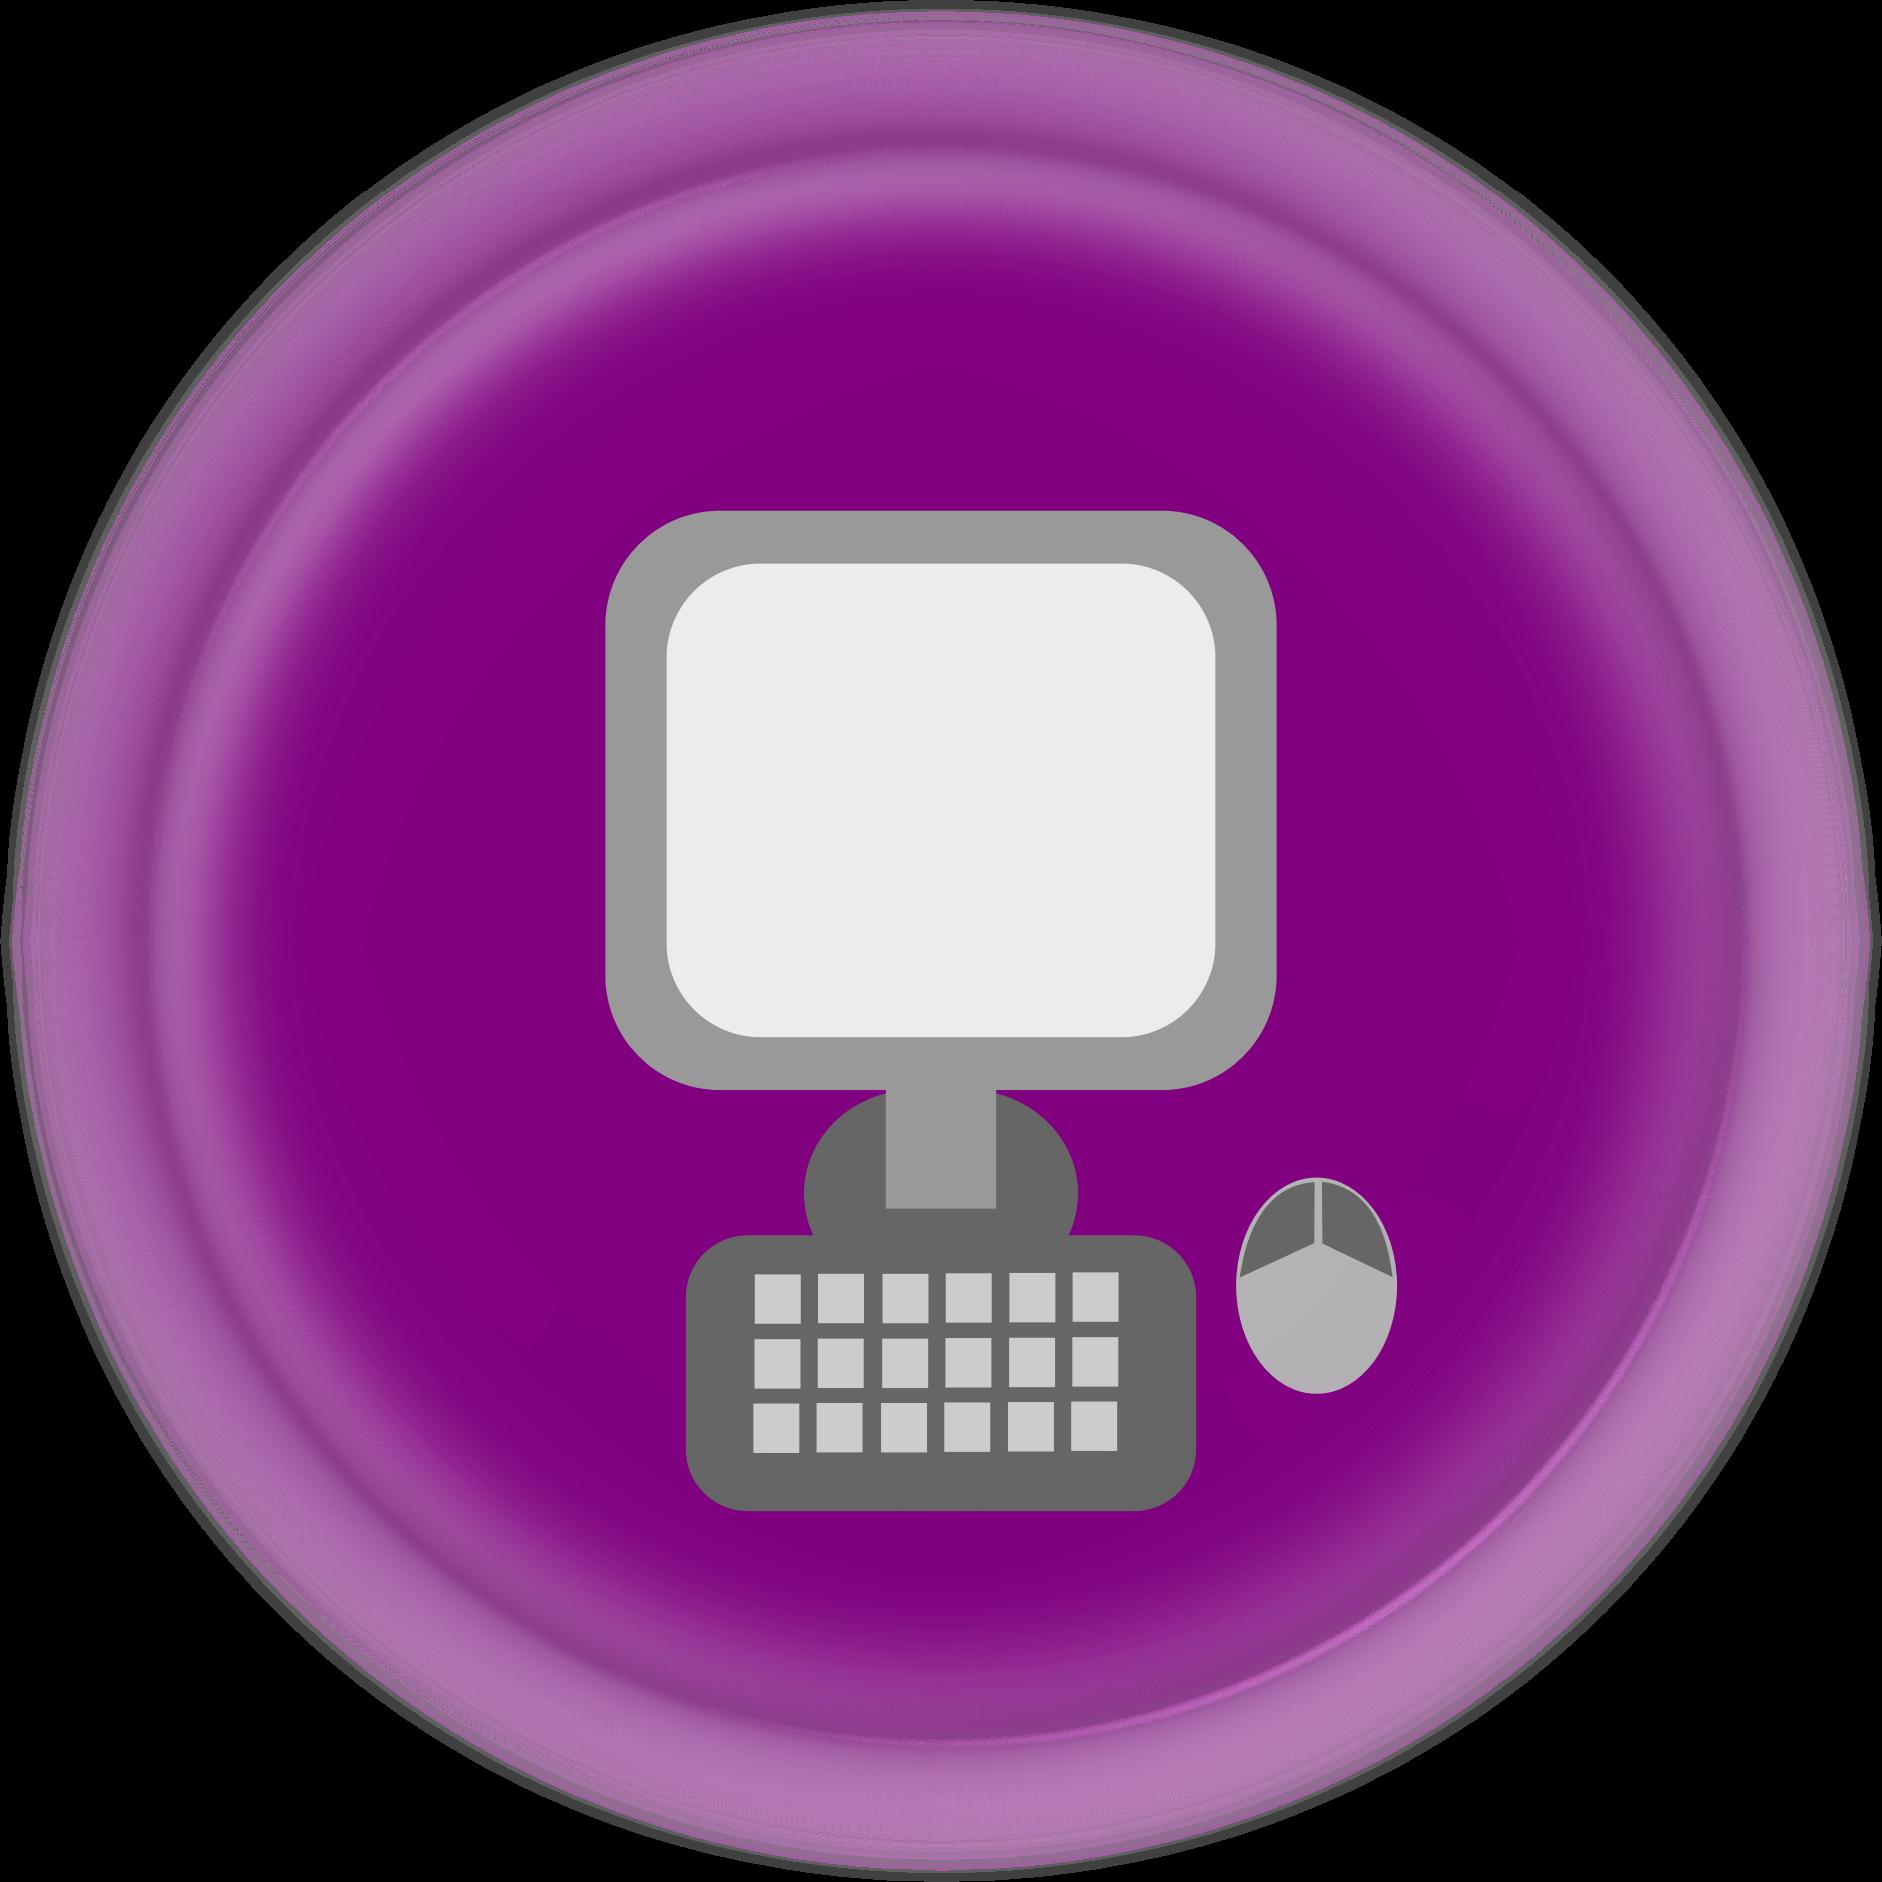 Icon big image png. Circle clipart computer